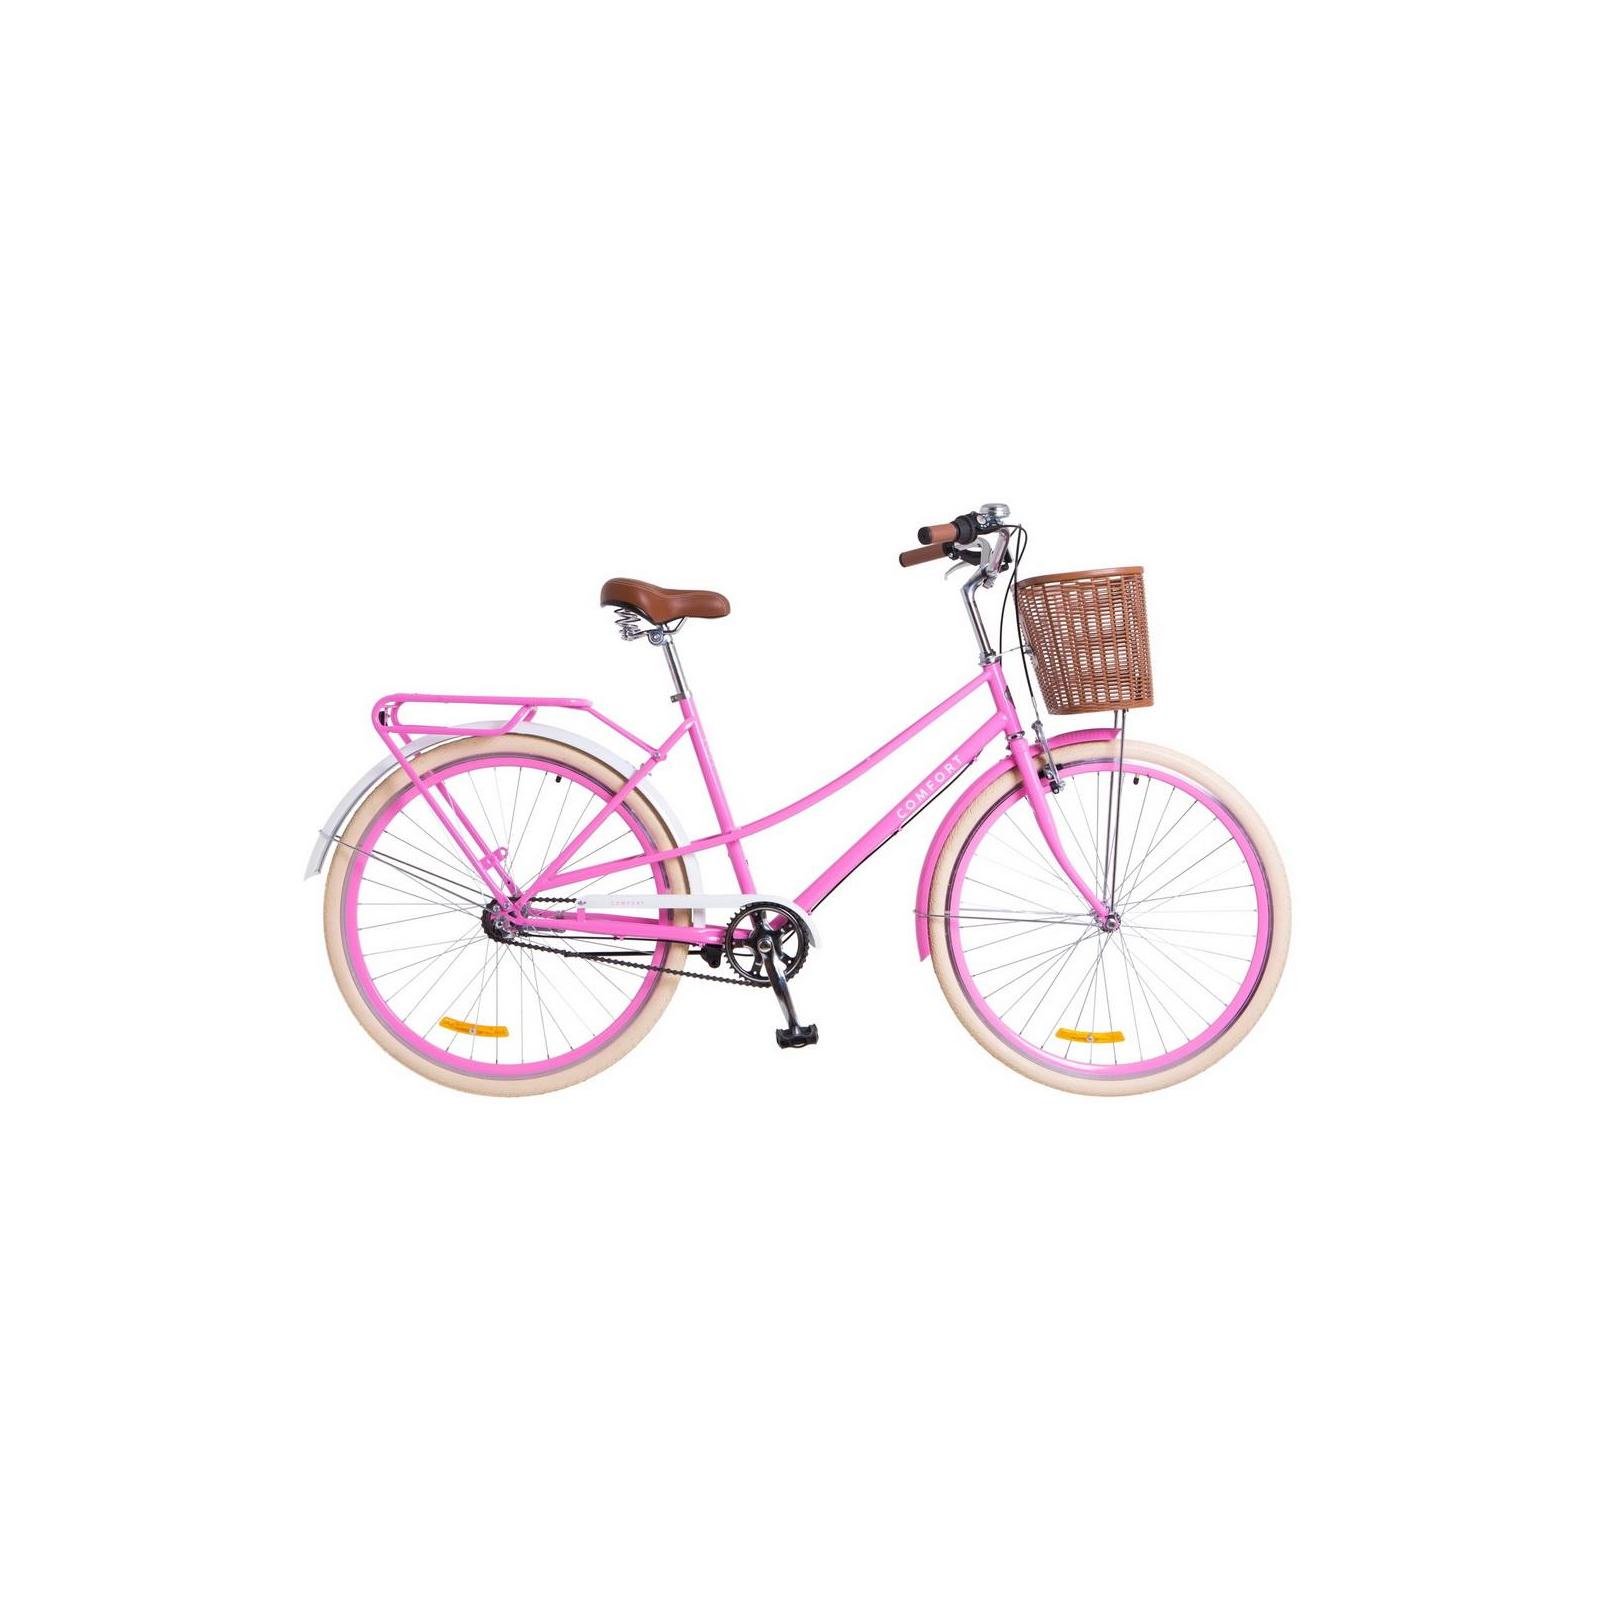 "Велосипед Дорожник 28"" COMFORT FEMALE 2018 14G планет. рама-19,5"" St сакура (OPS-D-28-111)"